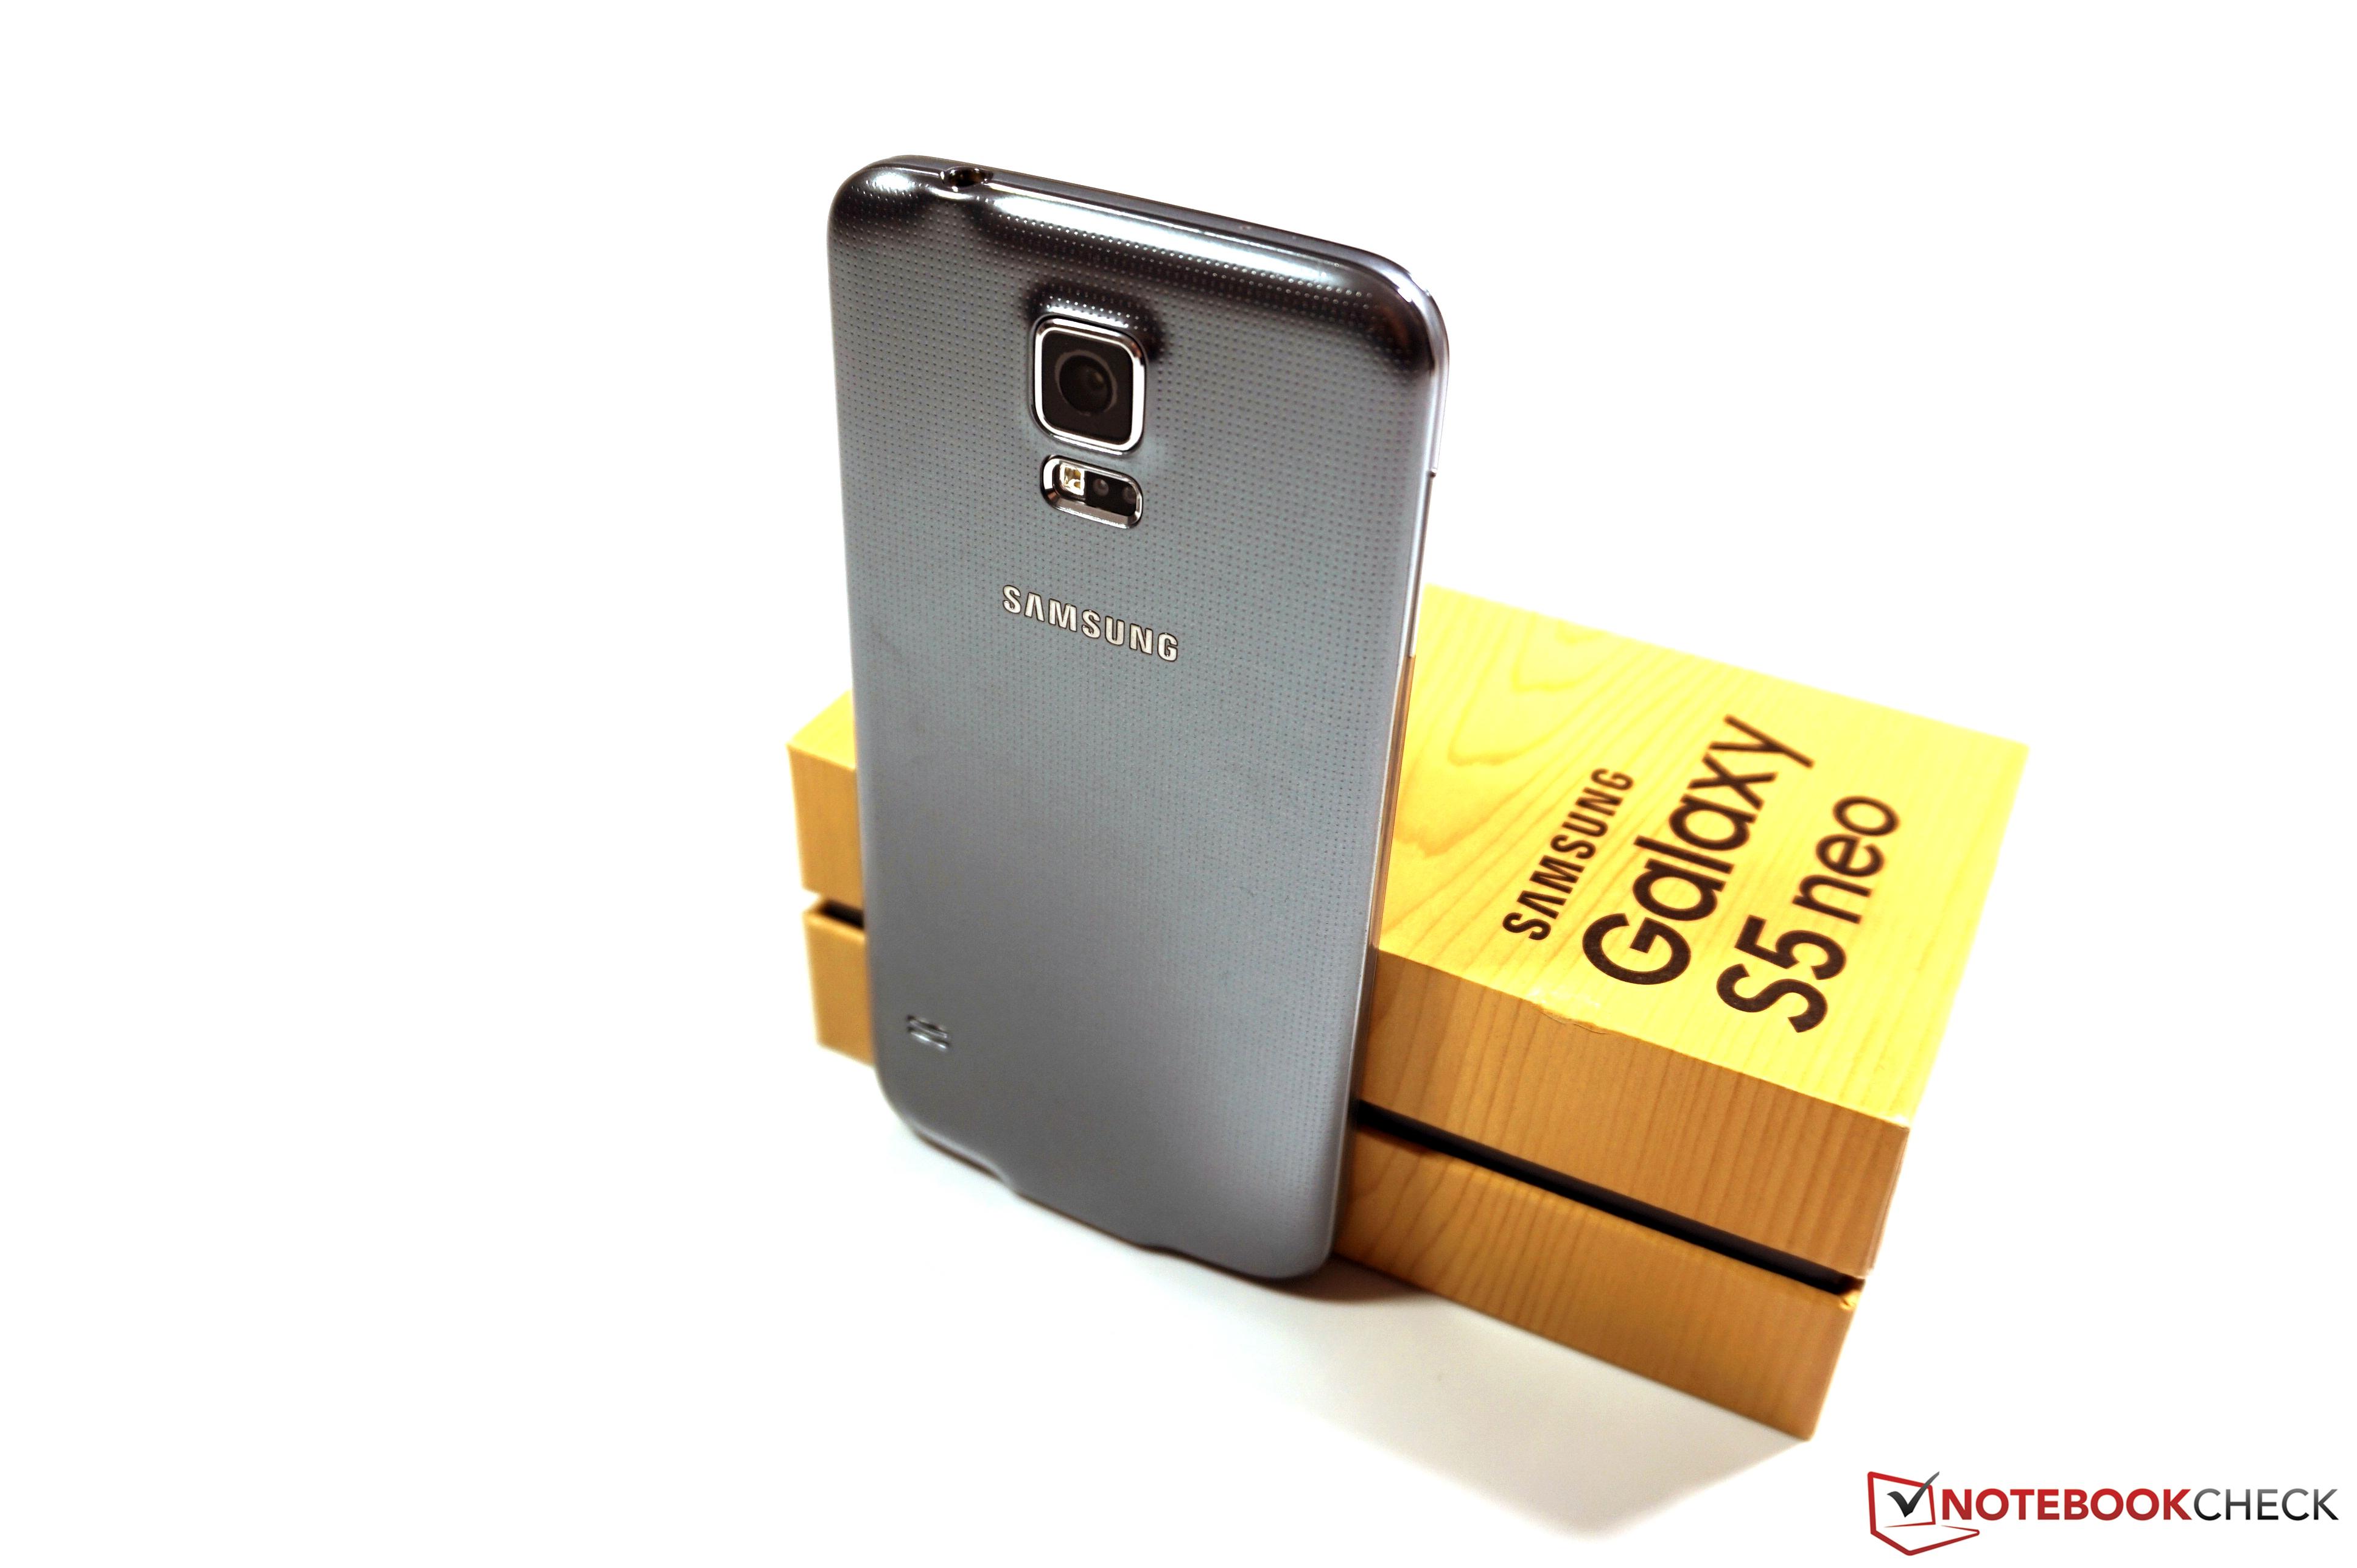 Courte Critique Du Smartphone Samsung Galaxy S5 Neo